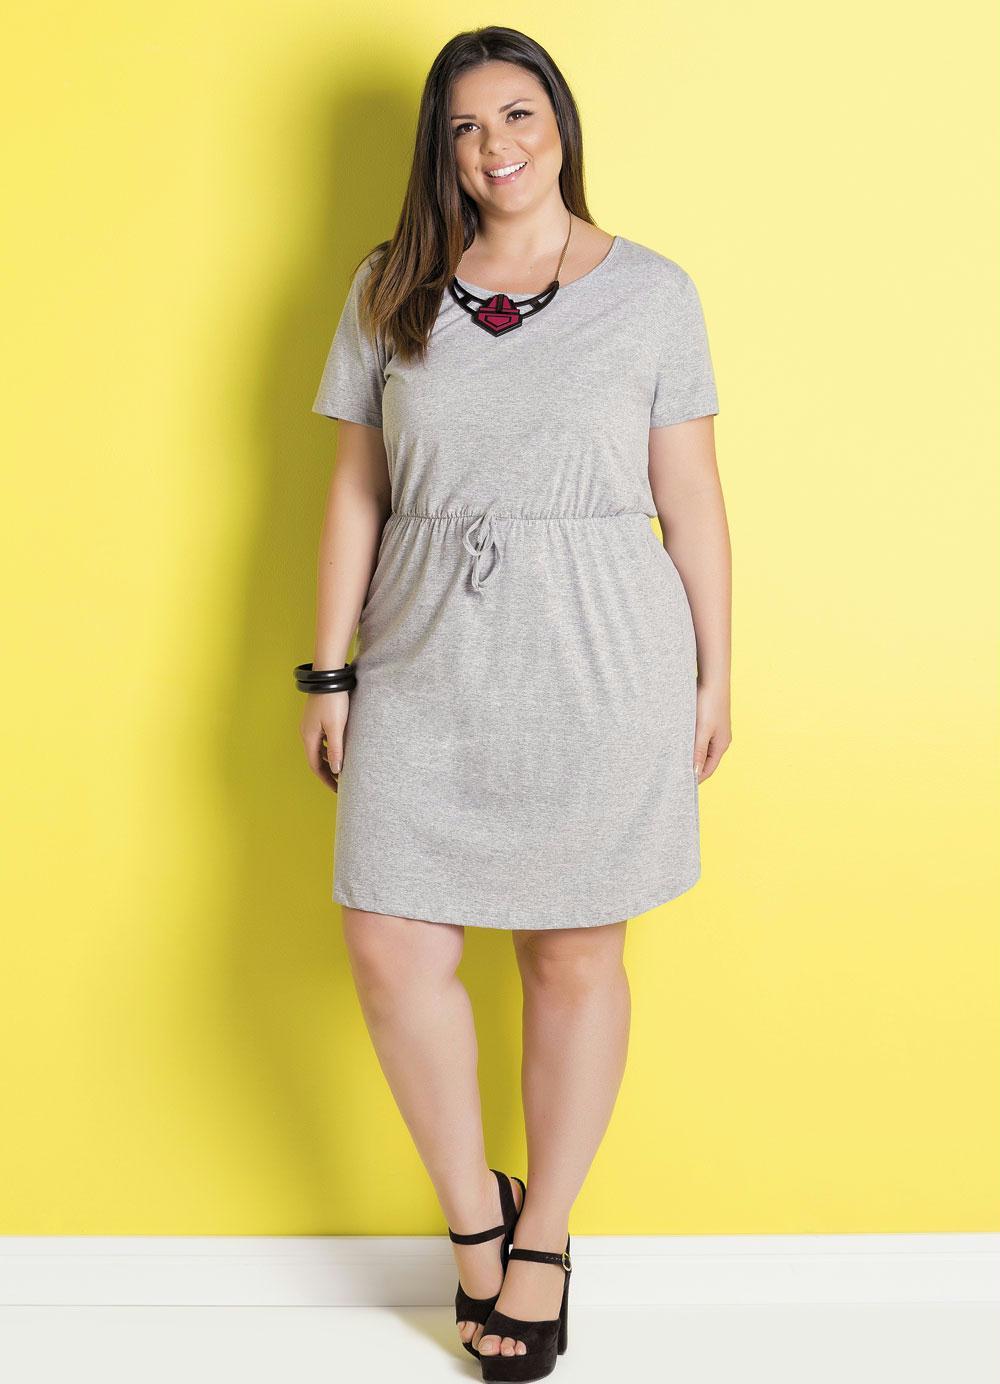 6e1ac0cf0 Vestido Mescla de Algodão Plus Size Marguerite - Marguerite